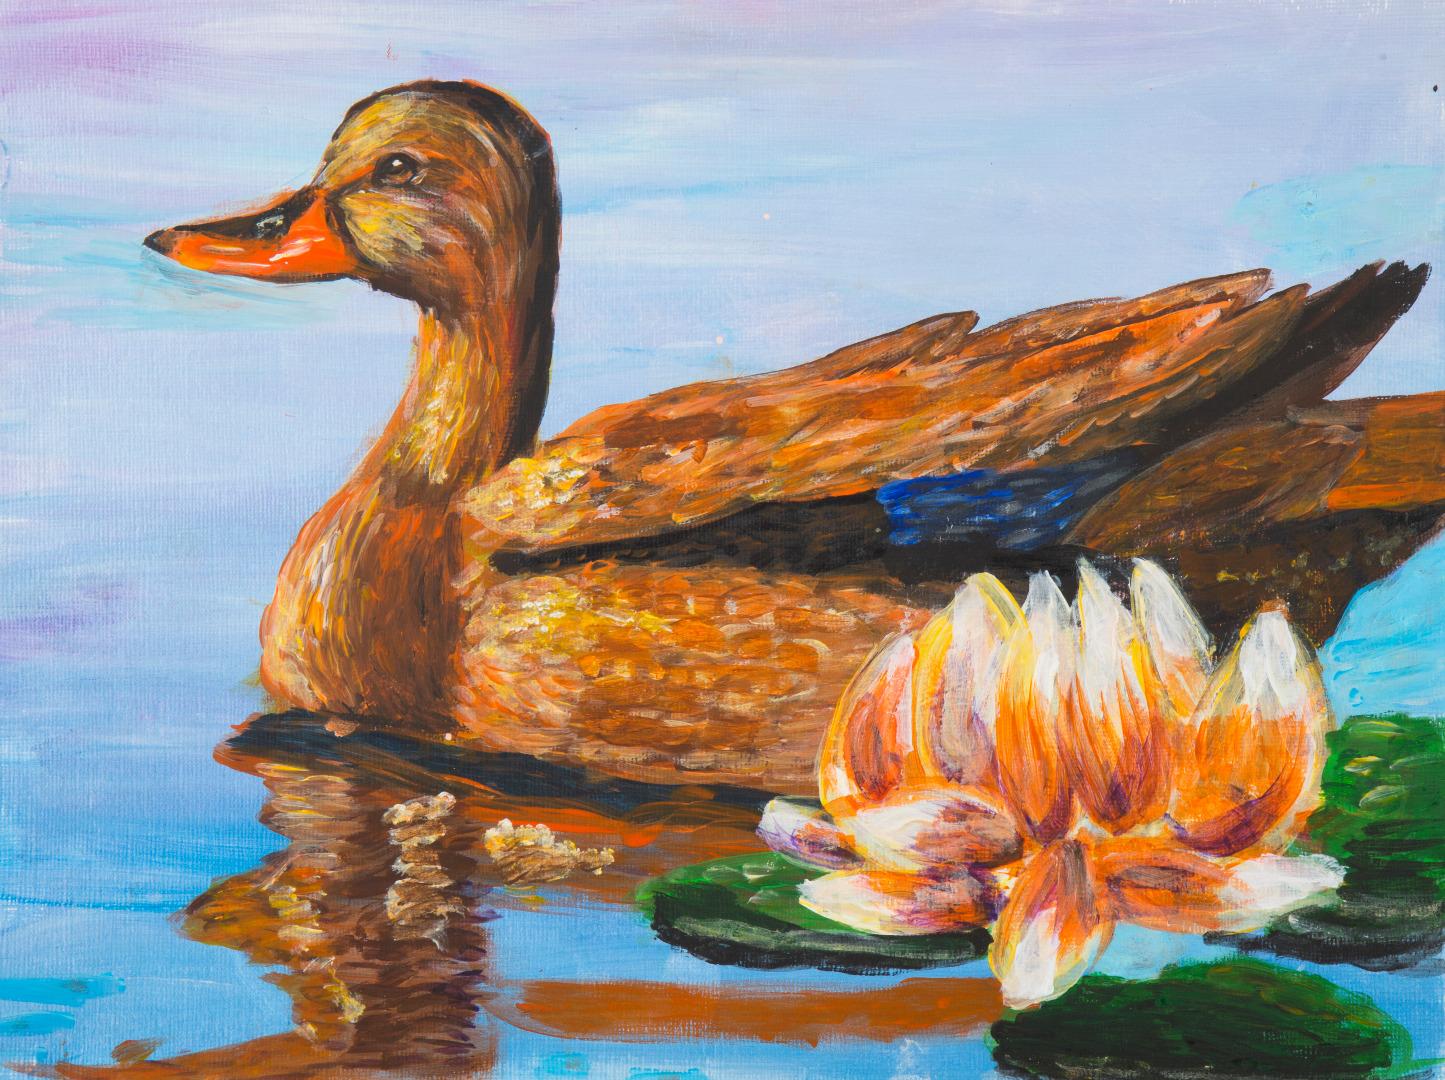 2nd-grader Jayden Cheuk's The Duck in the Pond